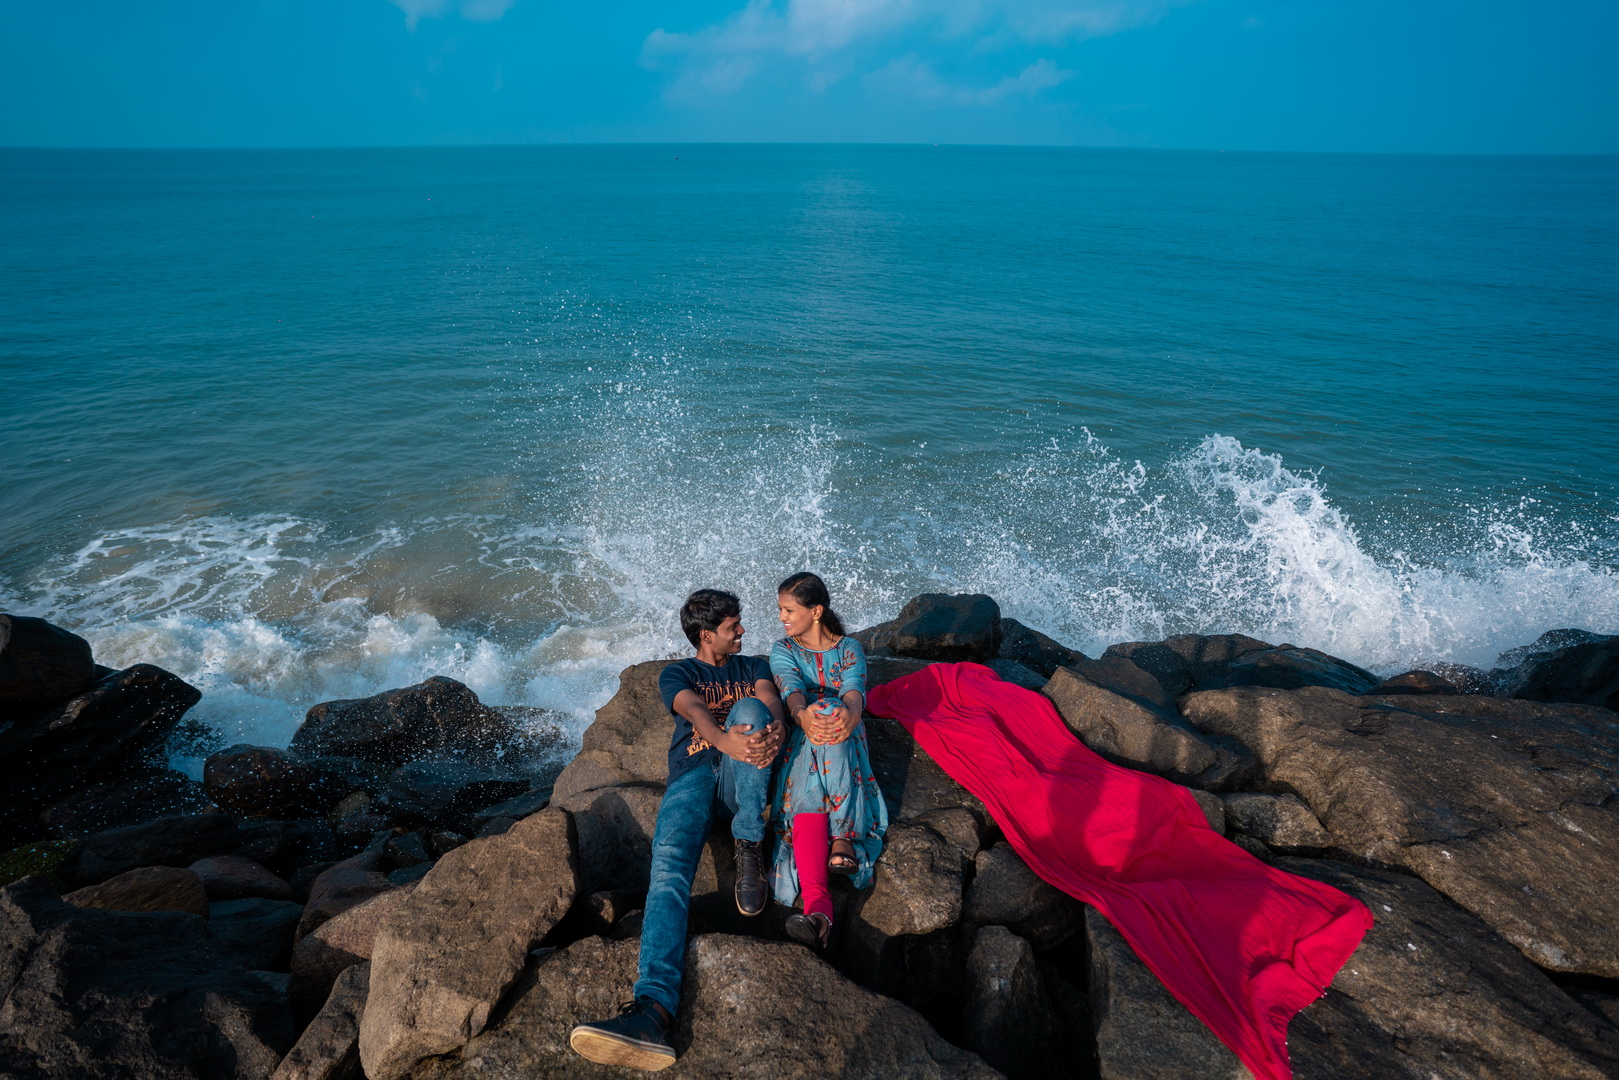 wedding photography in erode janaki videos (3)